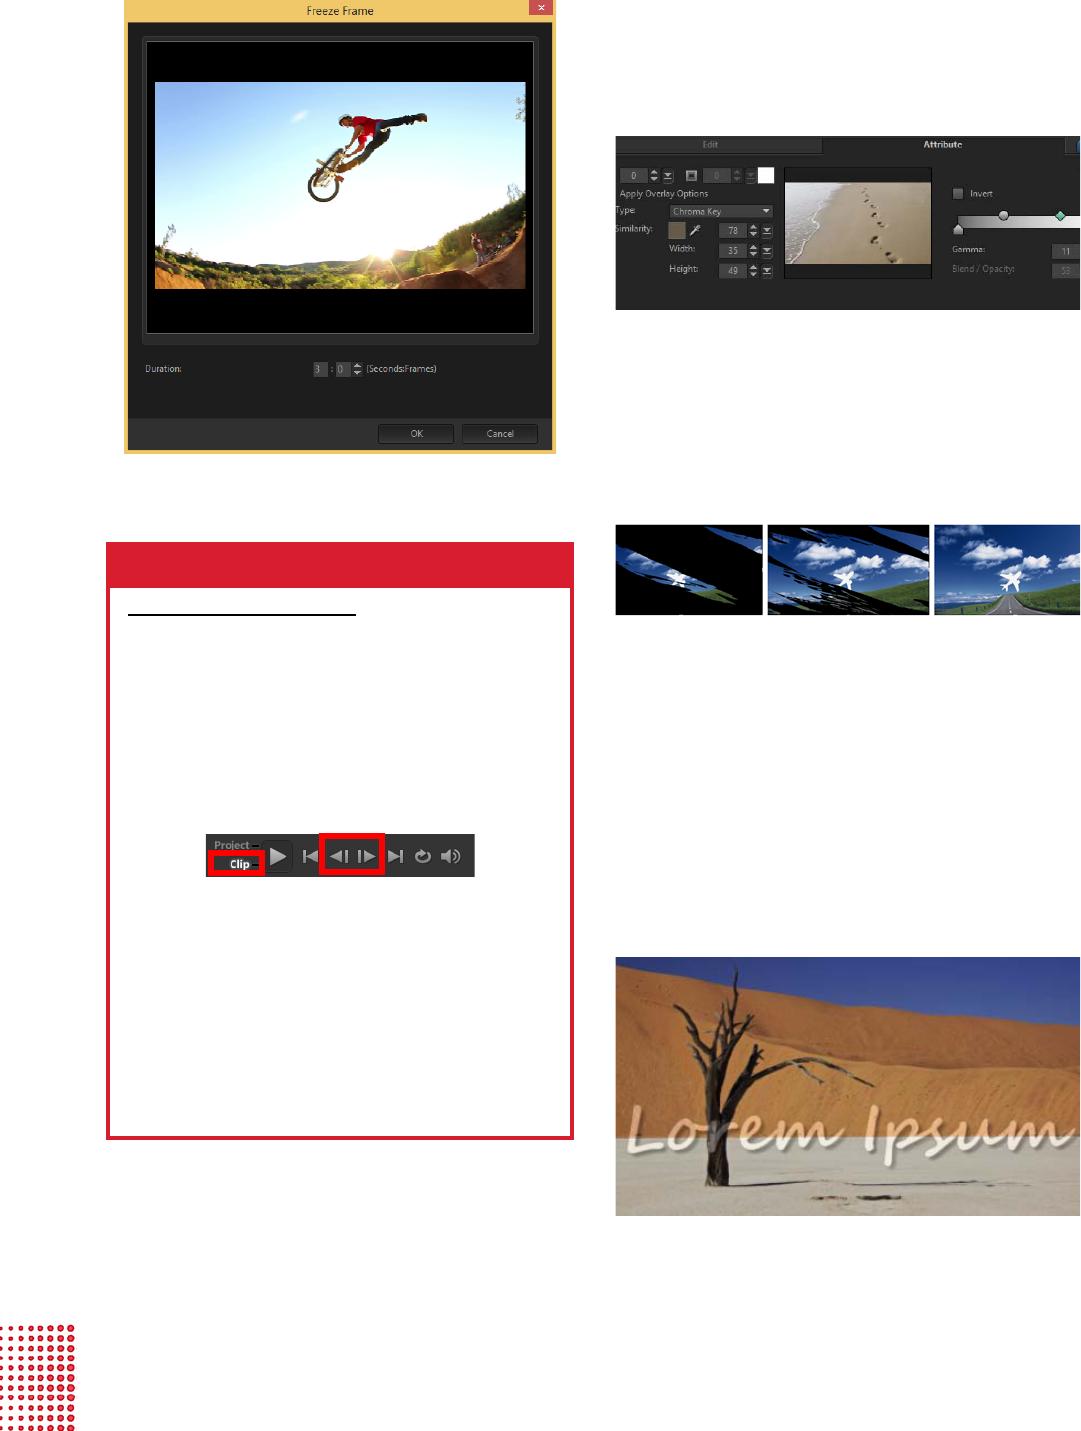 Handleiding Corel Videostudio Pro X8 Pagina 6 Van 19 English